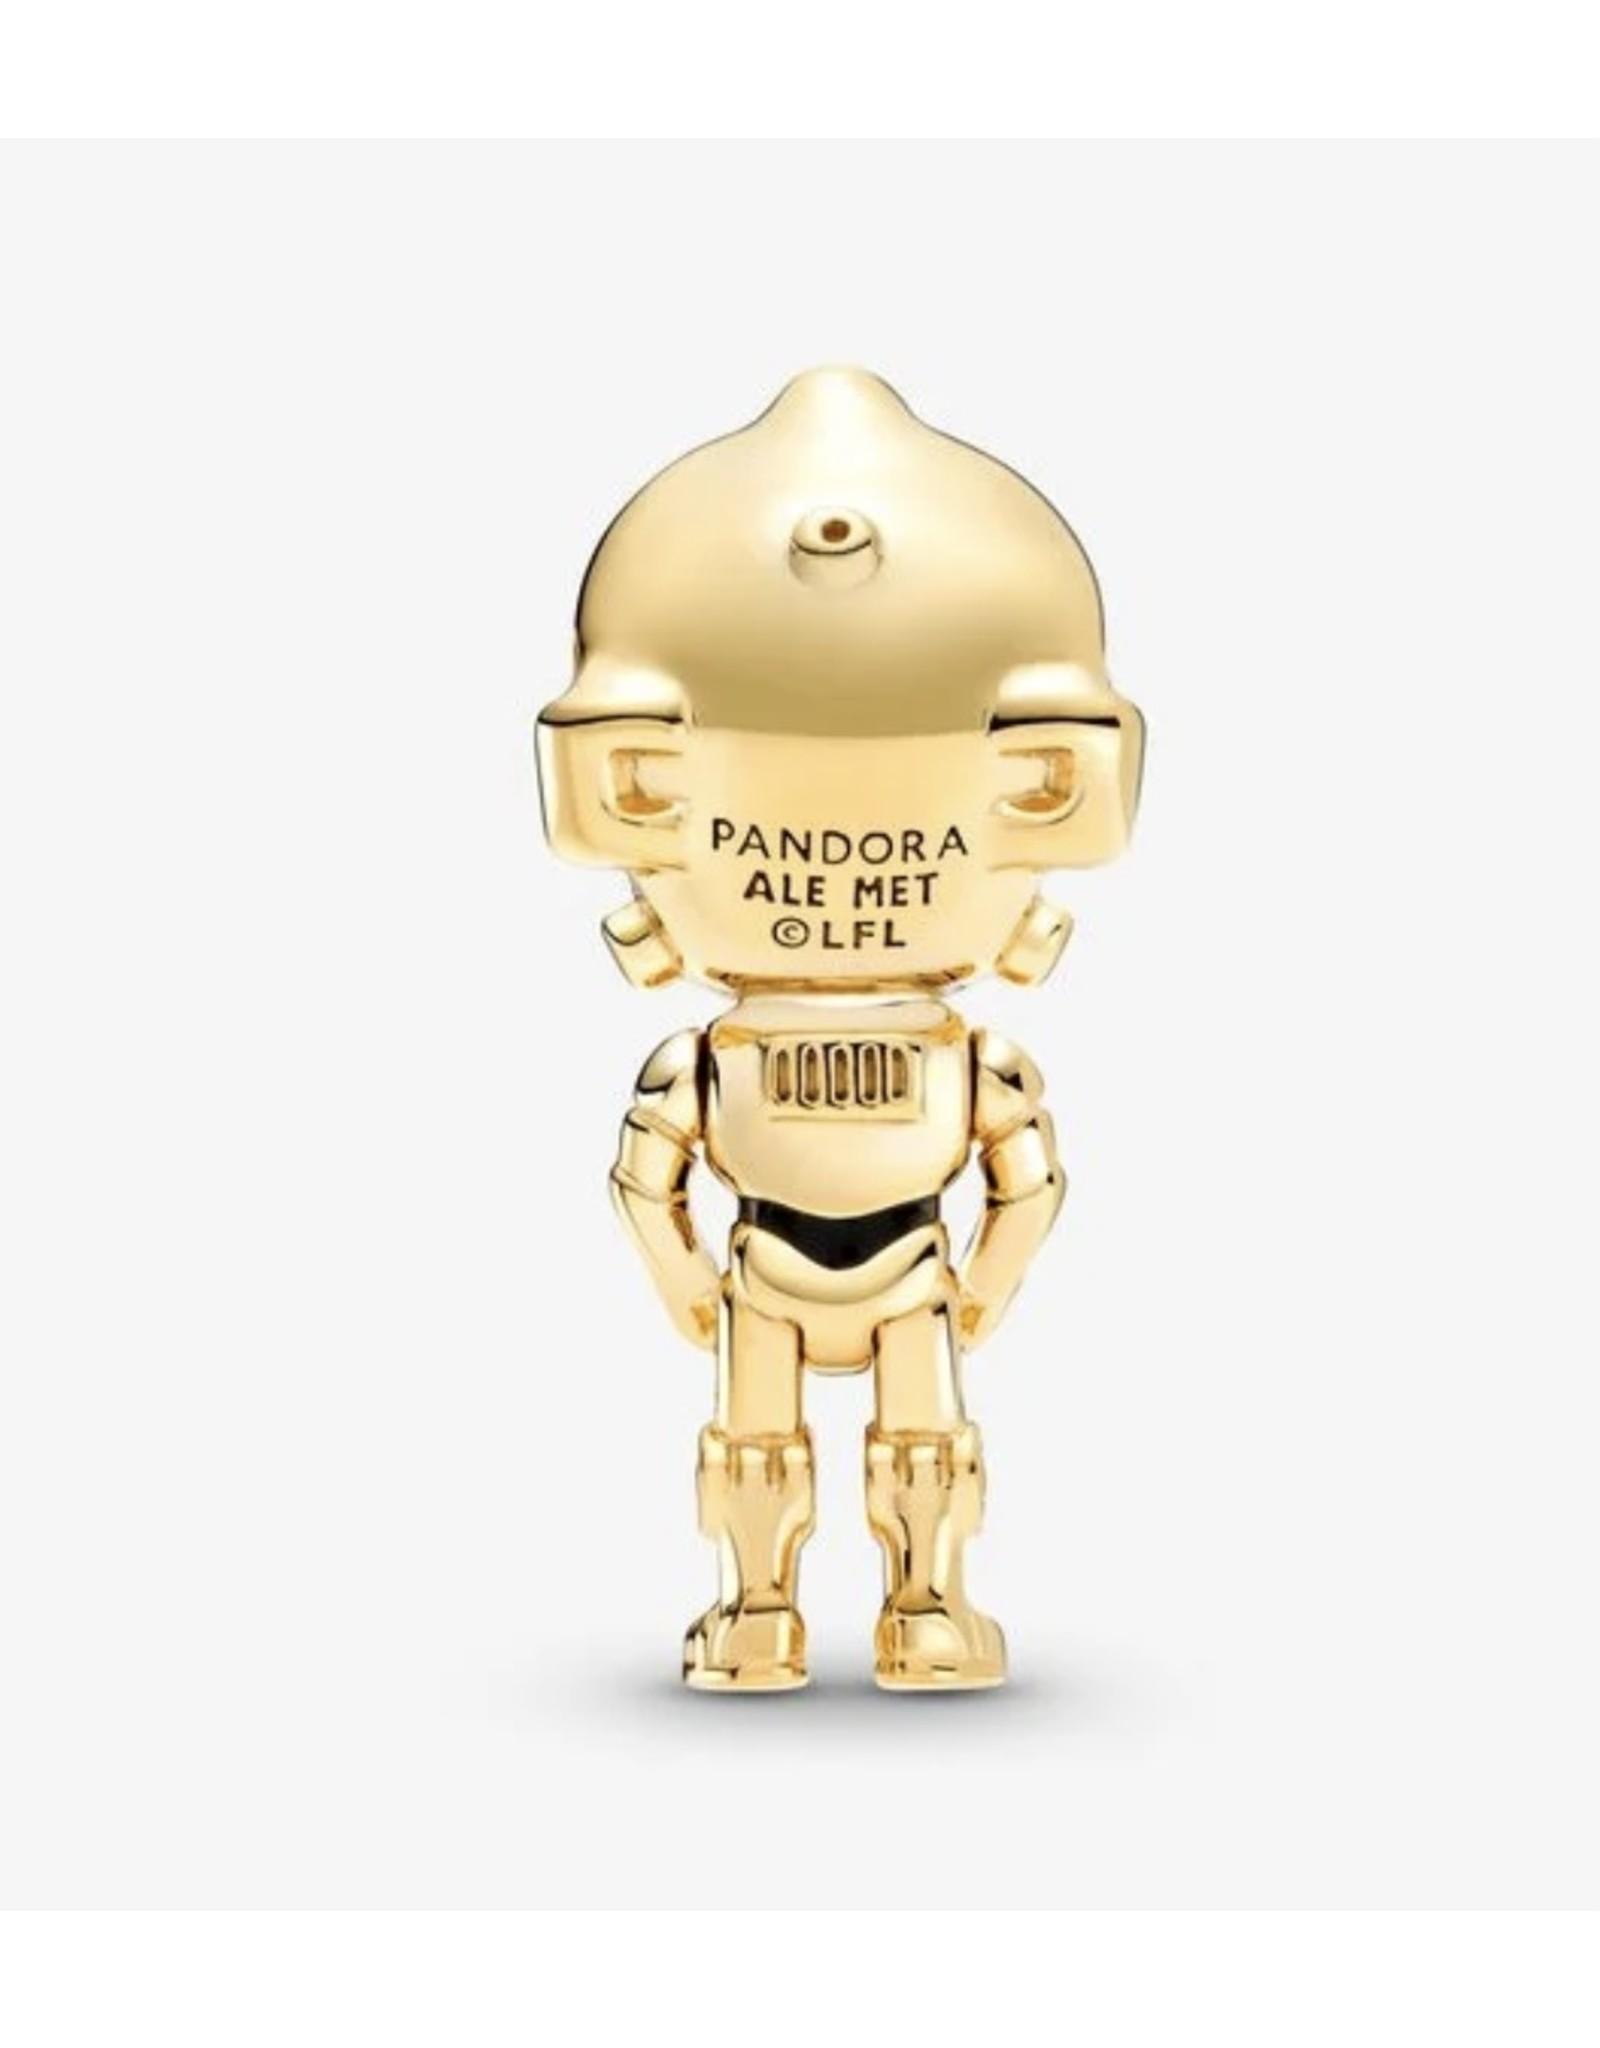 Pandora Pandora Charm,769244C01, Star Wars C-3PO, Black Enamel